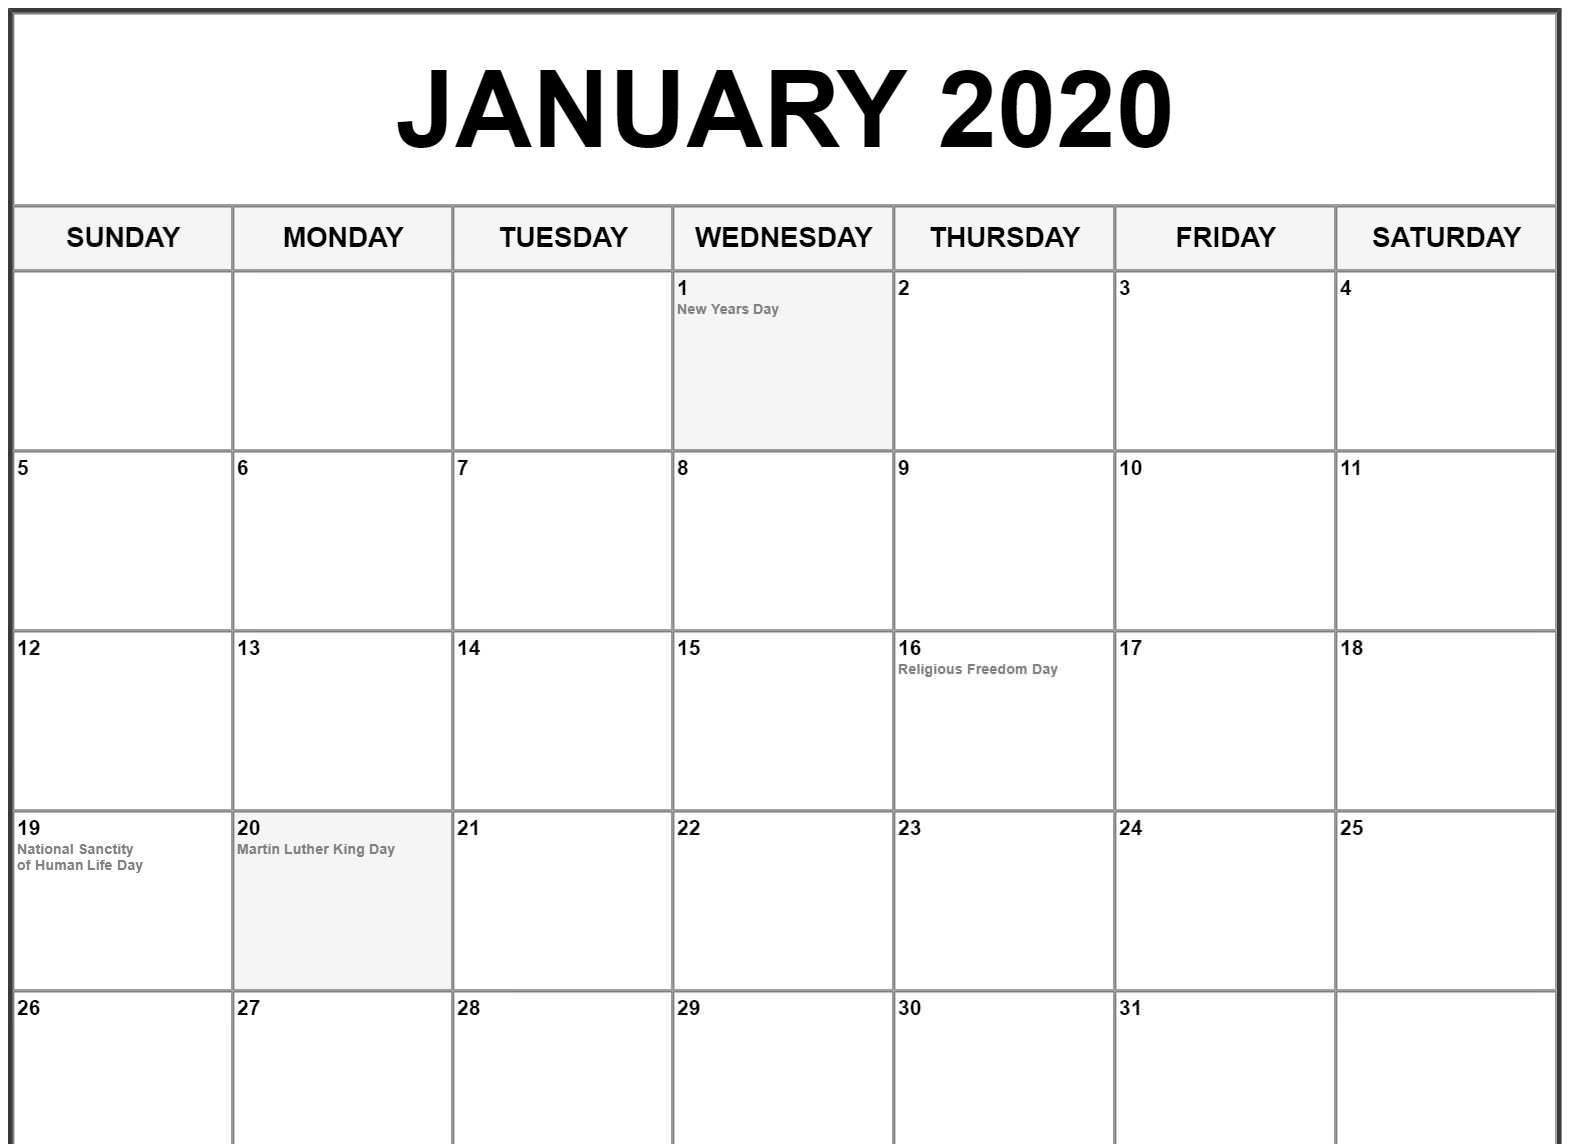 January 2020 Calendar Us Holidays | February Calendar